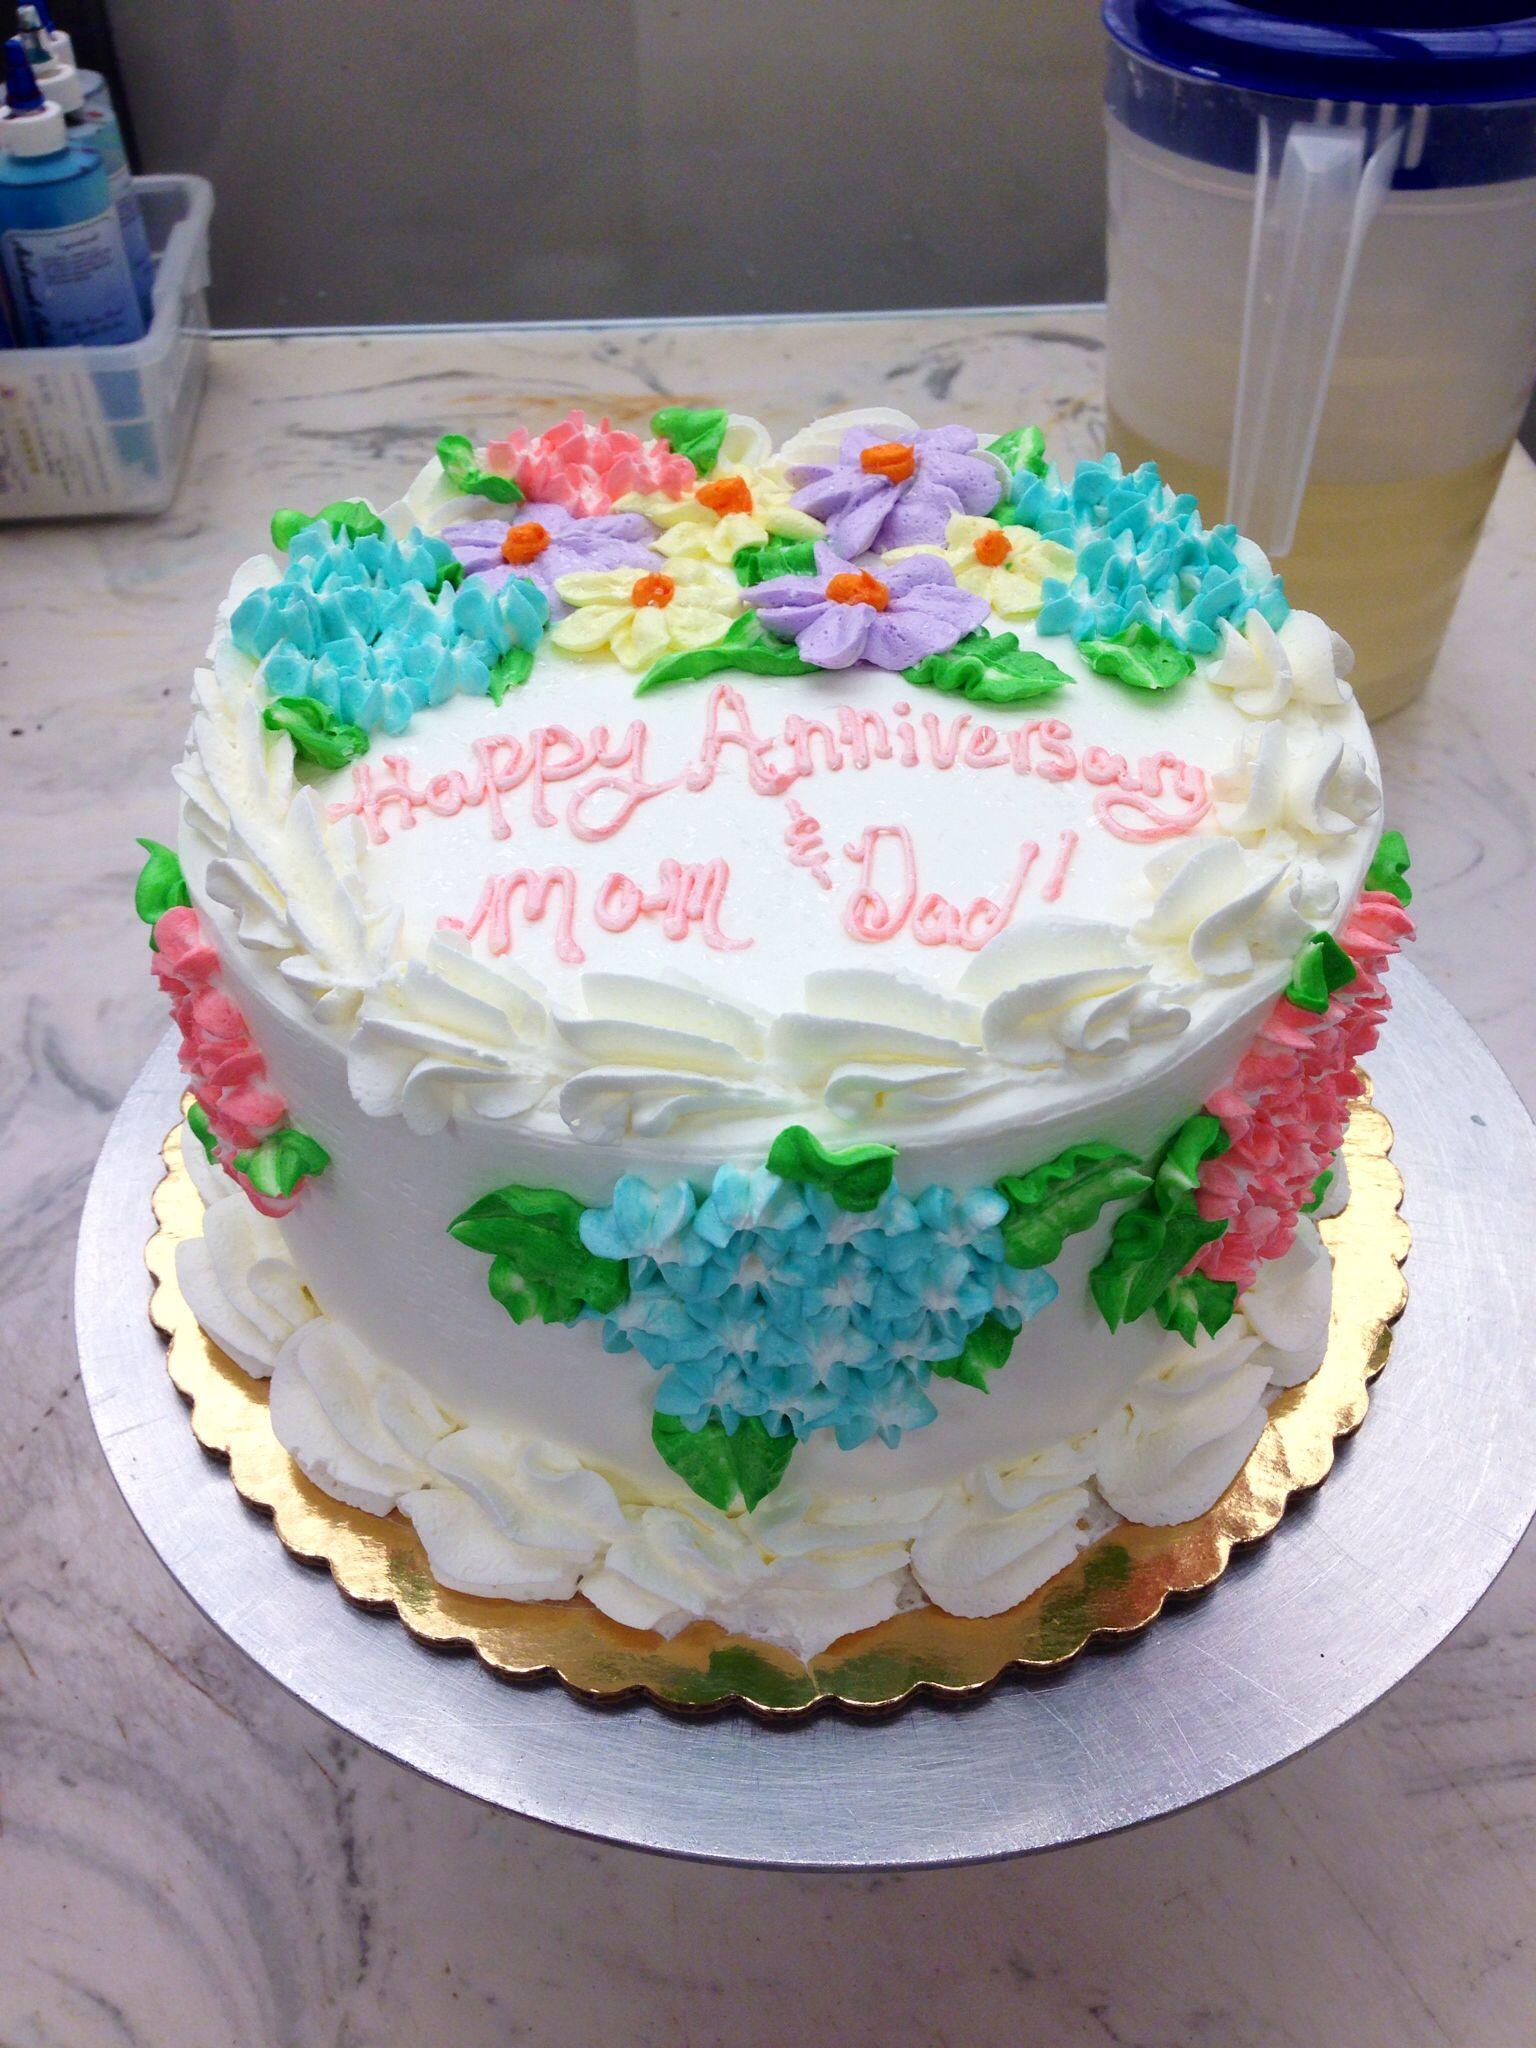 Publix Cake With Hydrangeas